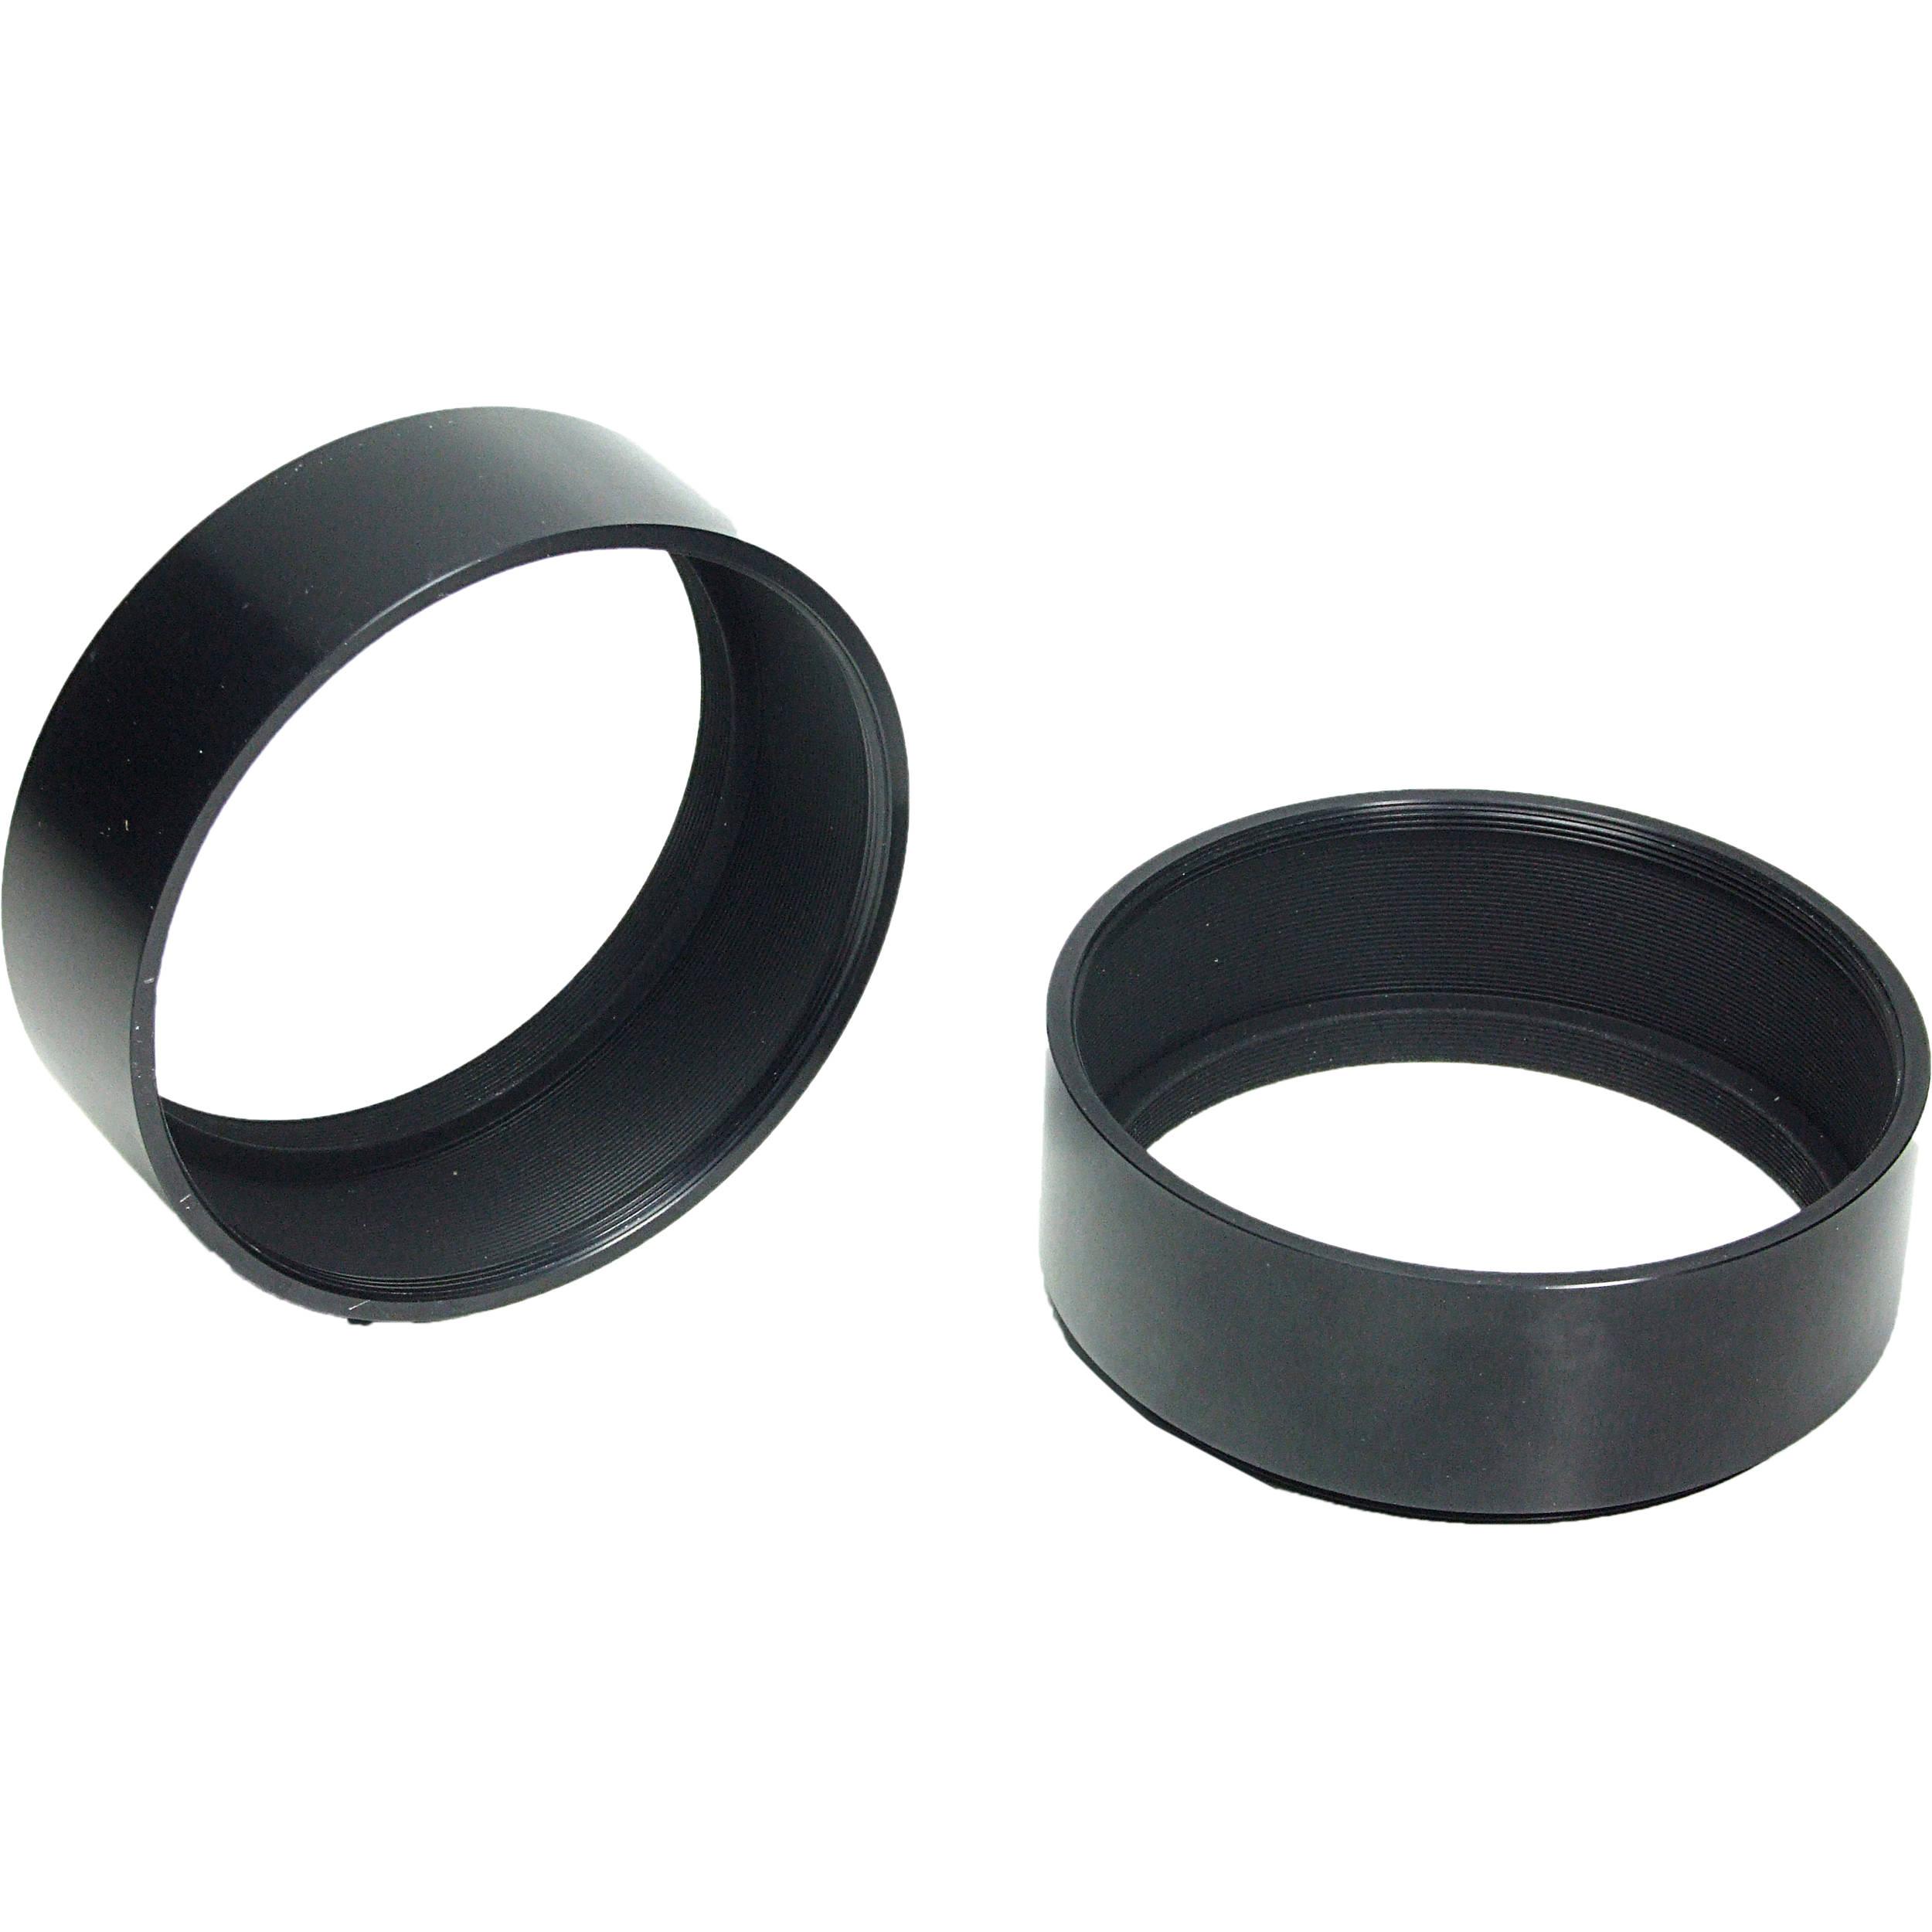 Lens Cap line 9 in1 49 52 55 58 62 67 72 77 82 mm Lens UV Filter 77mm Cloth ND UV CPL Filter Cap Cover CCD+ Air Blow 2 hot Shoe Lens Hood